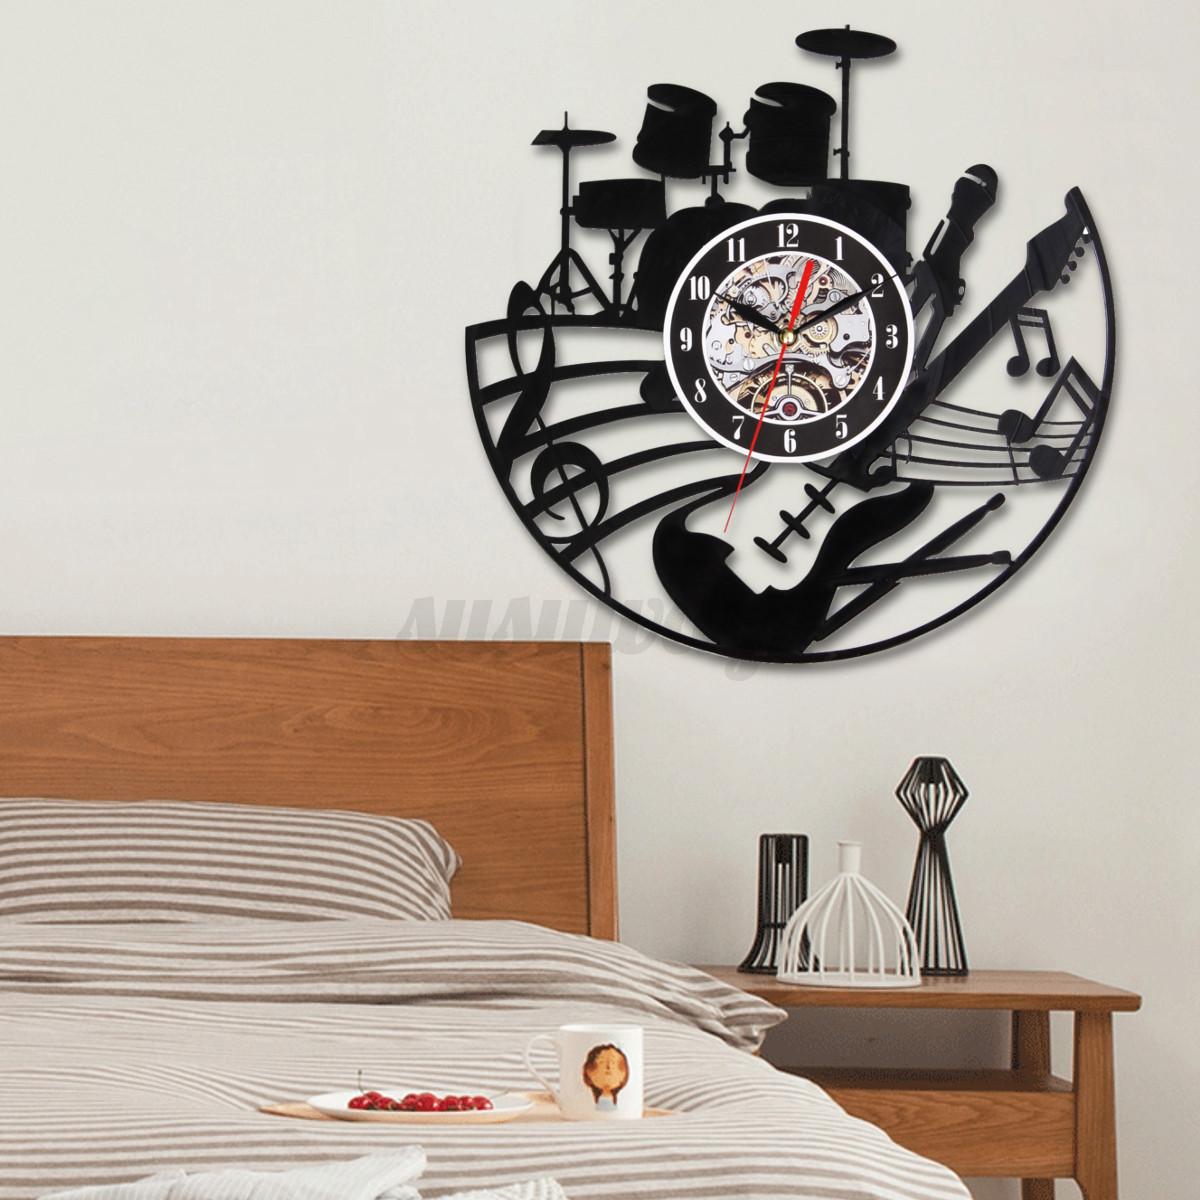 Modern Vintage Wall Decor : Retro animals cat vinyl record clock home wall modern